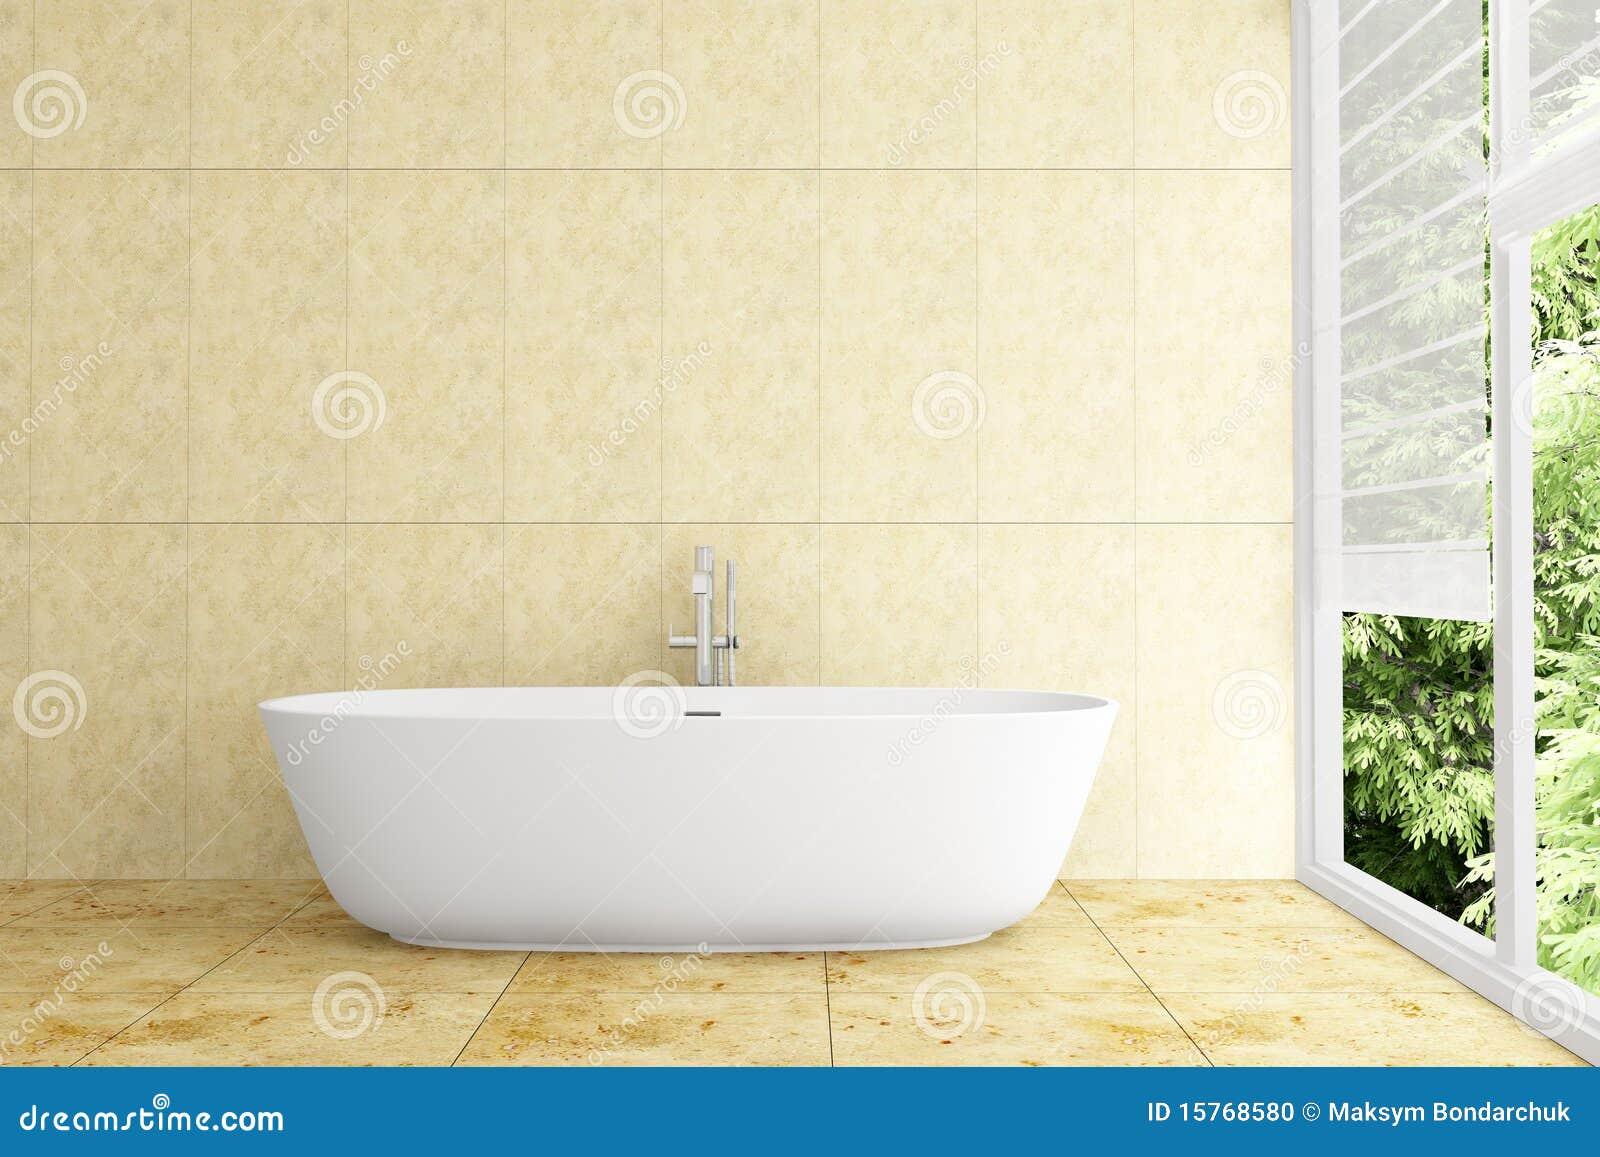 modern bathroom with beige tiles on wall stock photo image 15768580. Black Bedroom Furniture Sets. Home Design Ideas